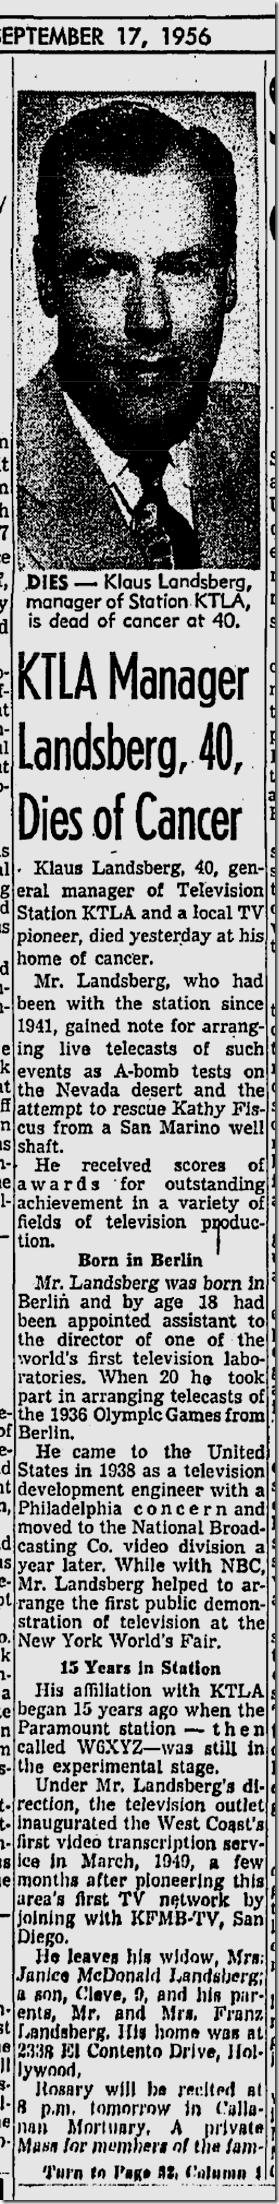 Sept. 17, 1956, Klaus Landsberg